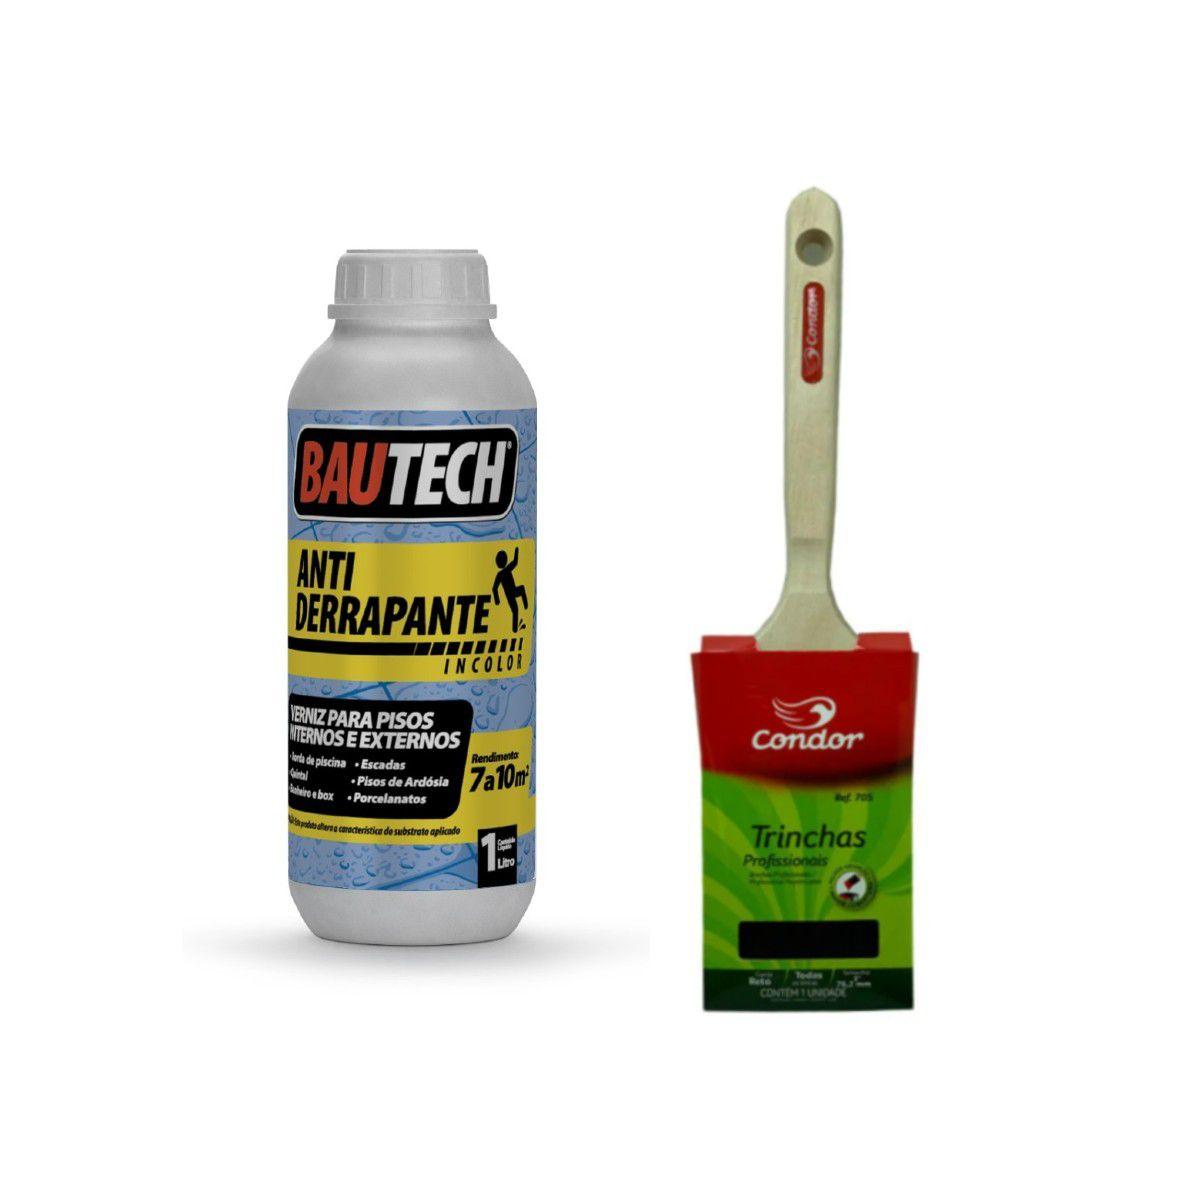 Verniz Antiderrapante Bautech 1L  + Trincha Reta Profissional 3